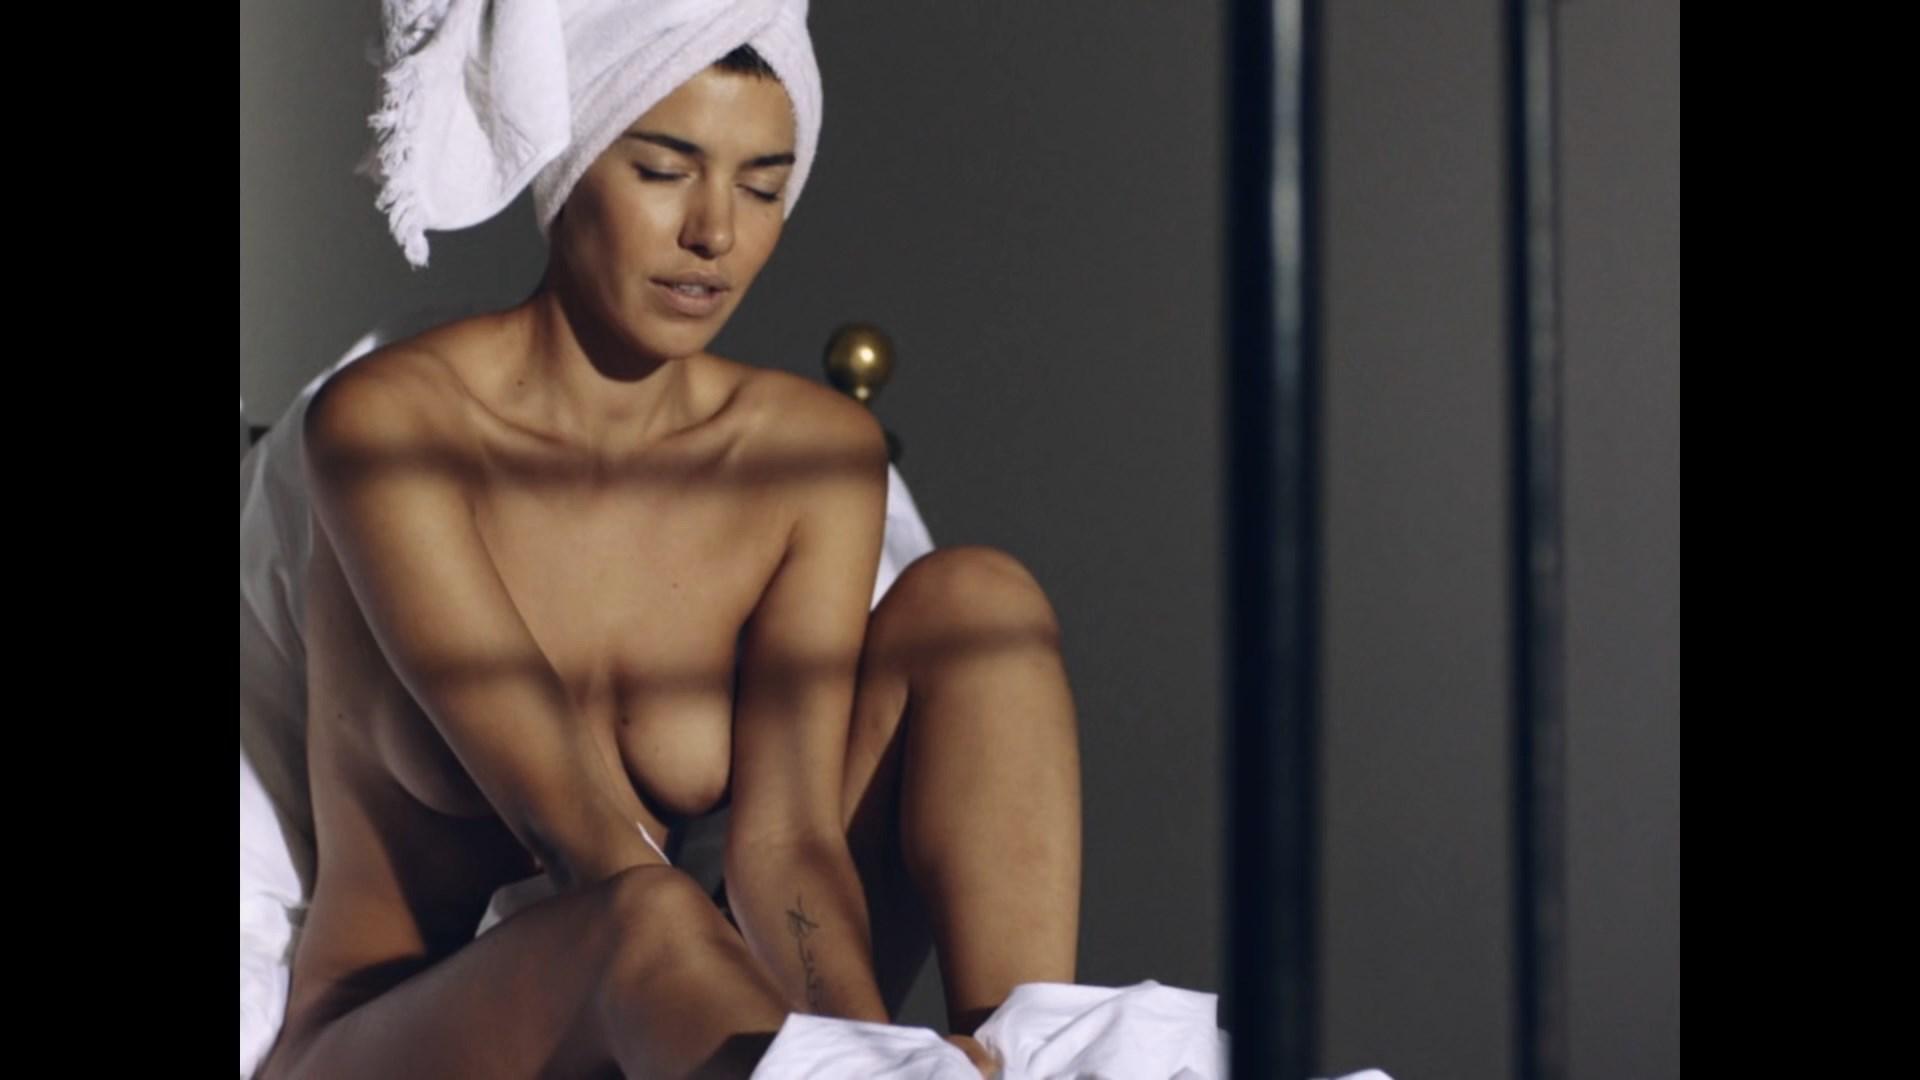 Watch Soraja vucelic tits video